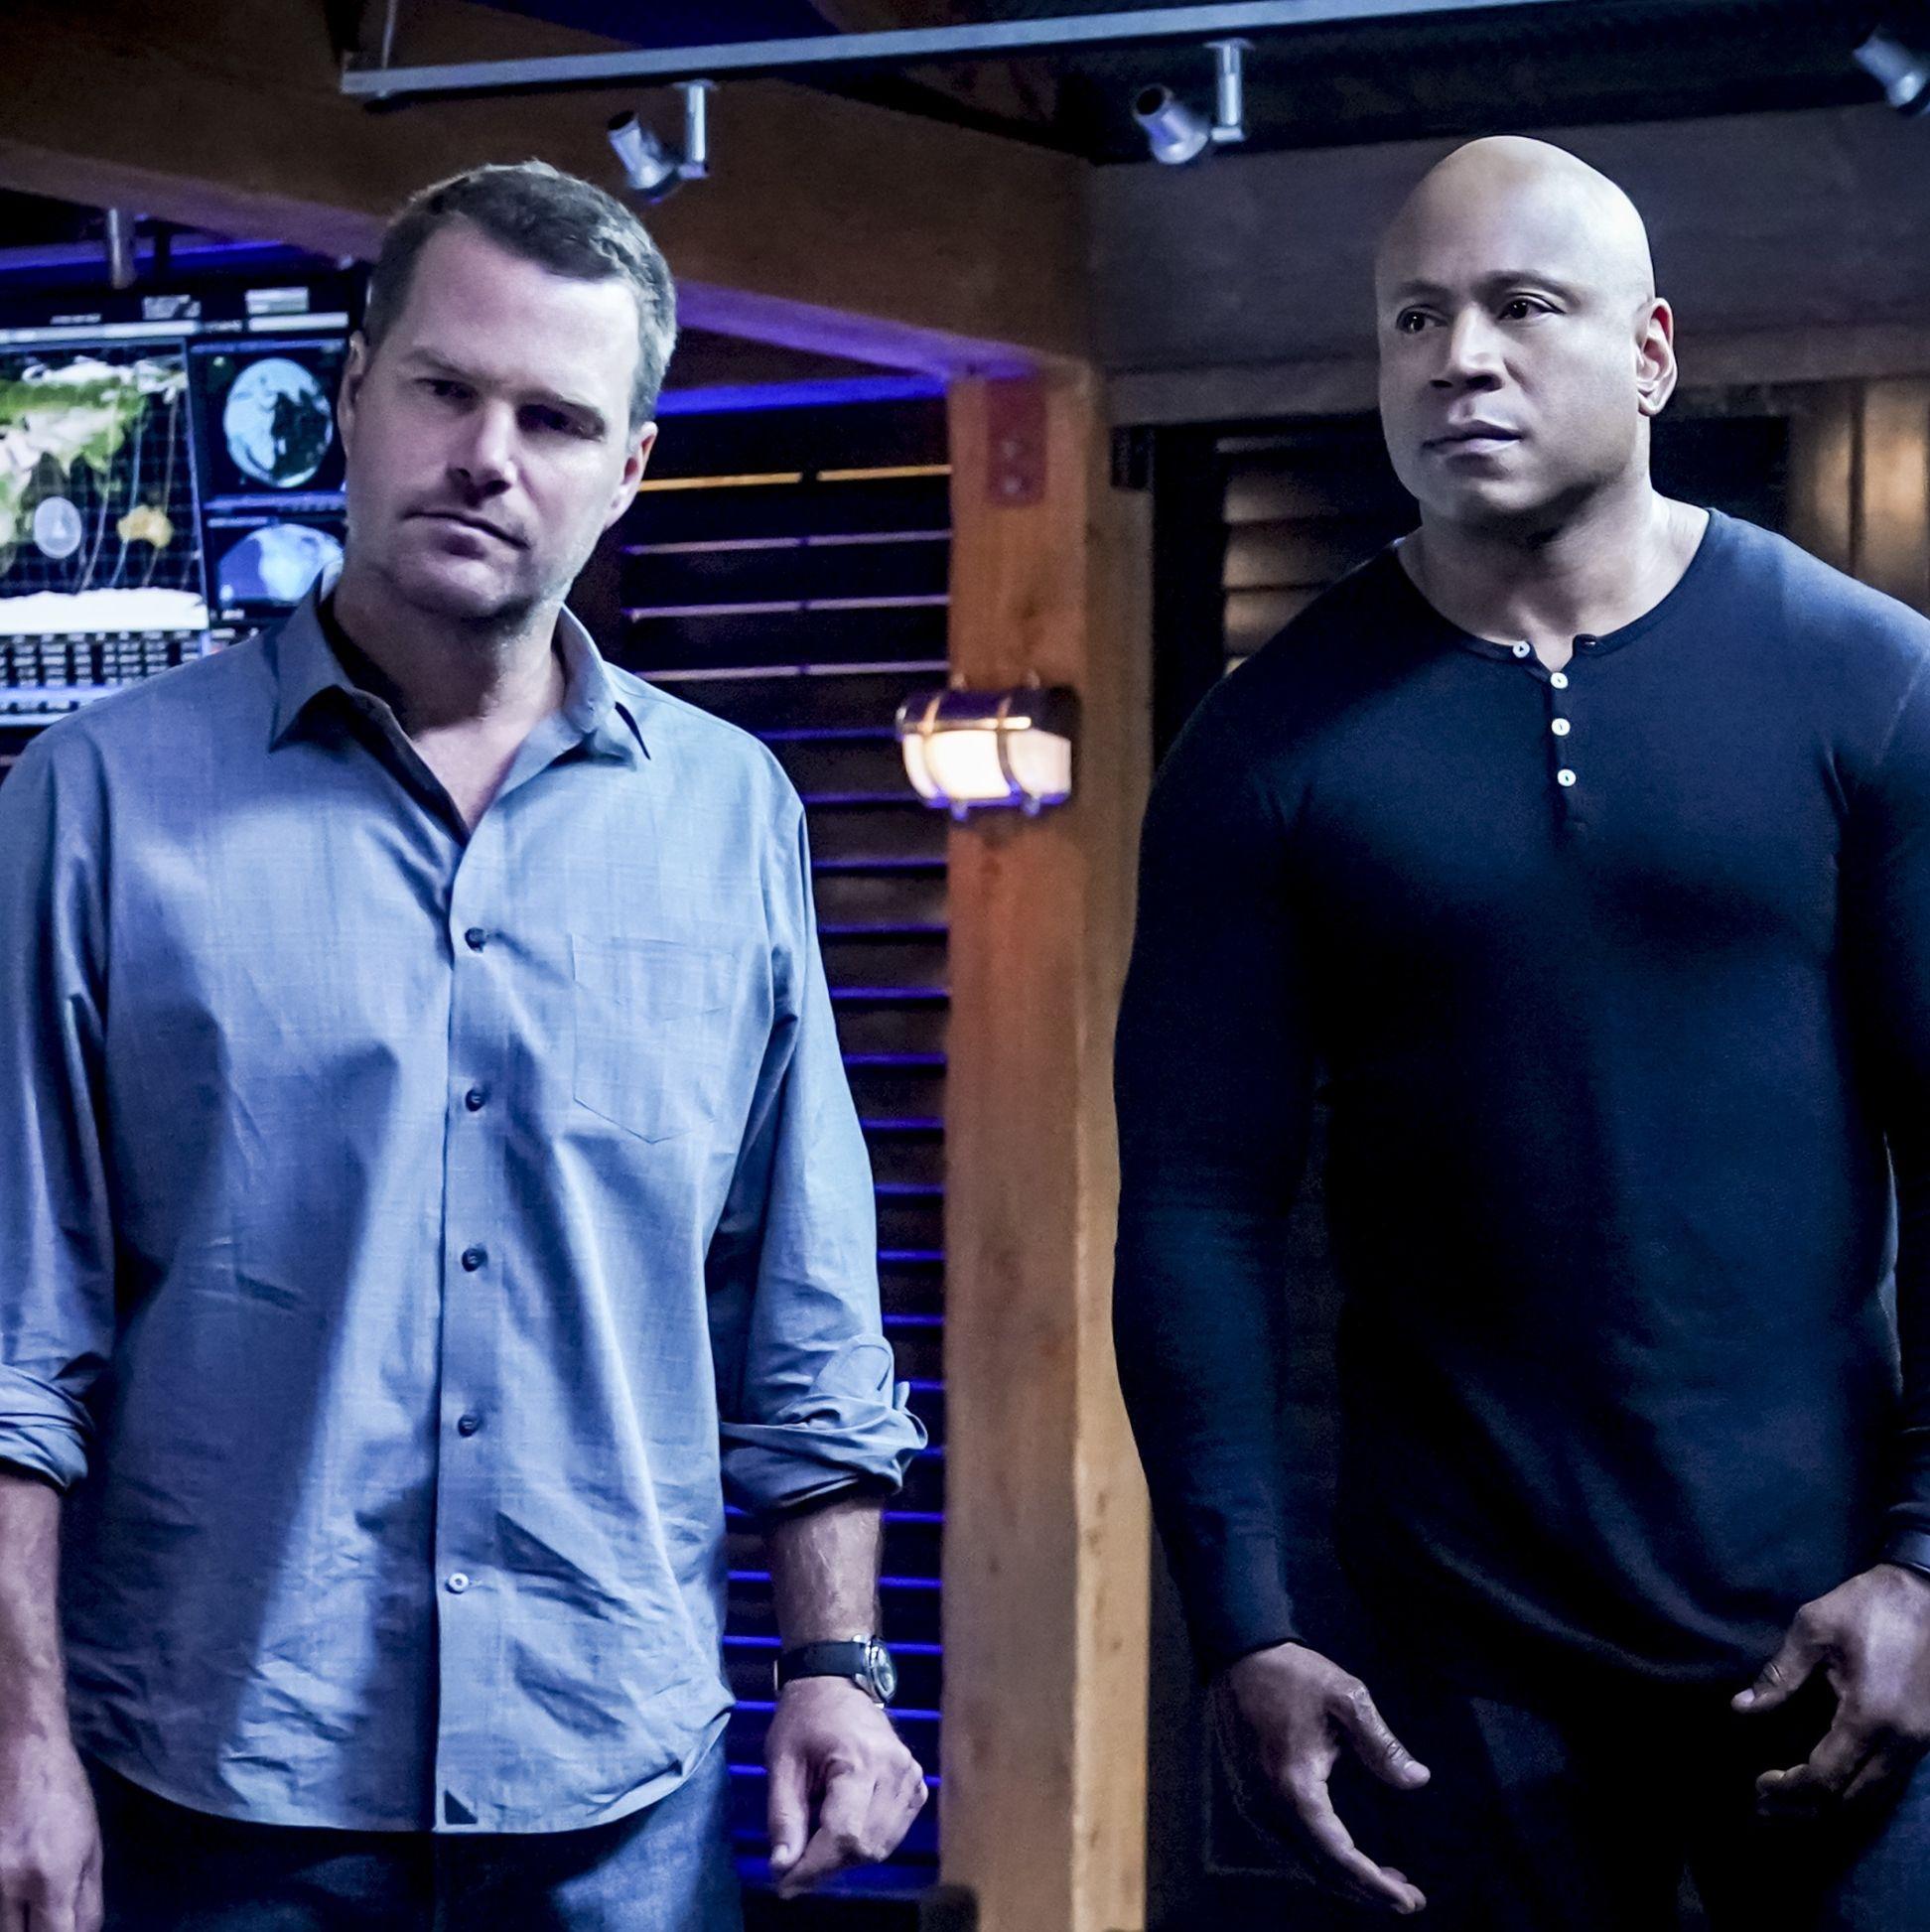 ef575ecee NCIS: Los Angeles season 11 – everything you need to know